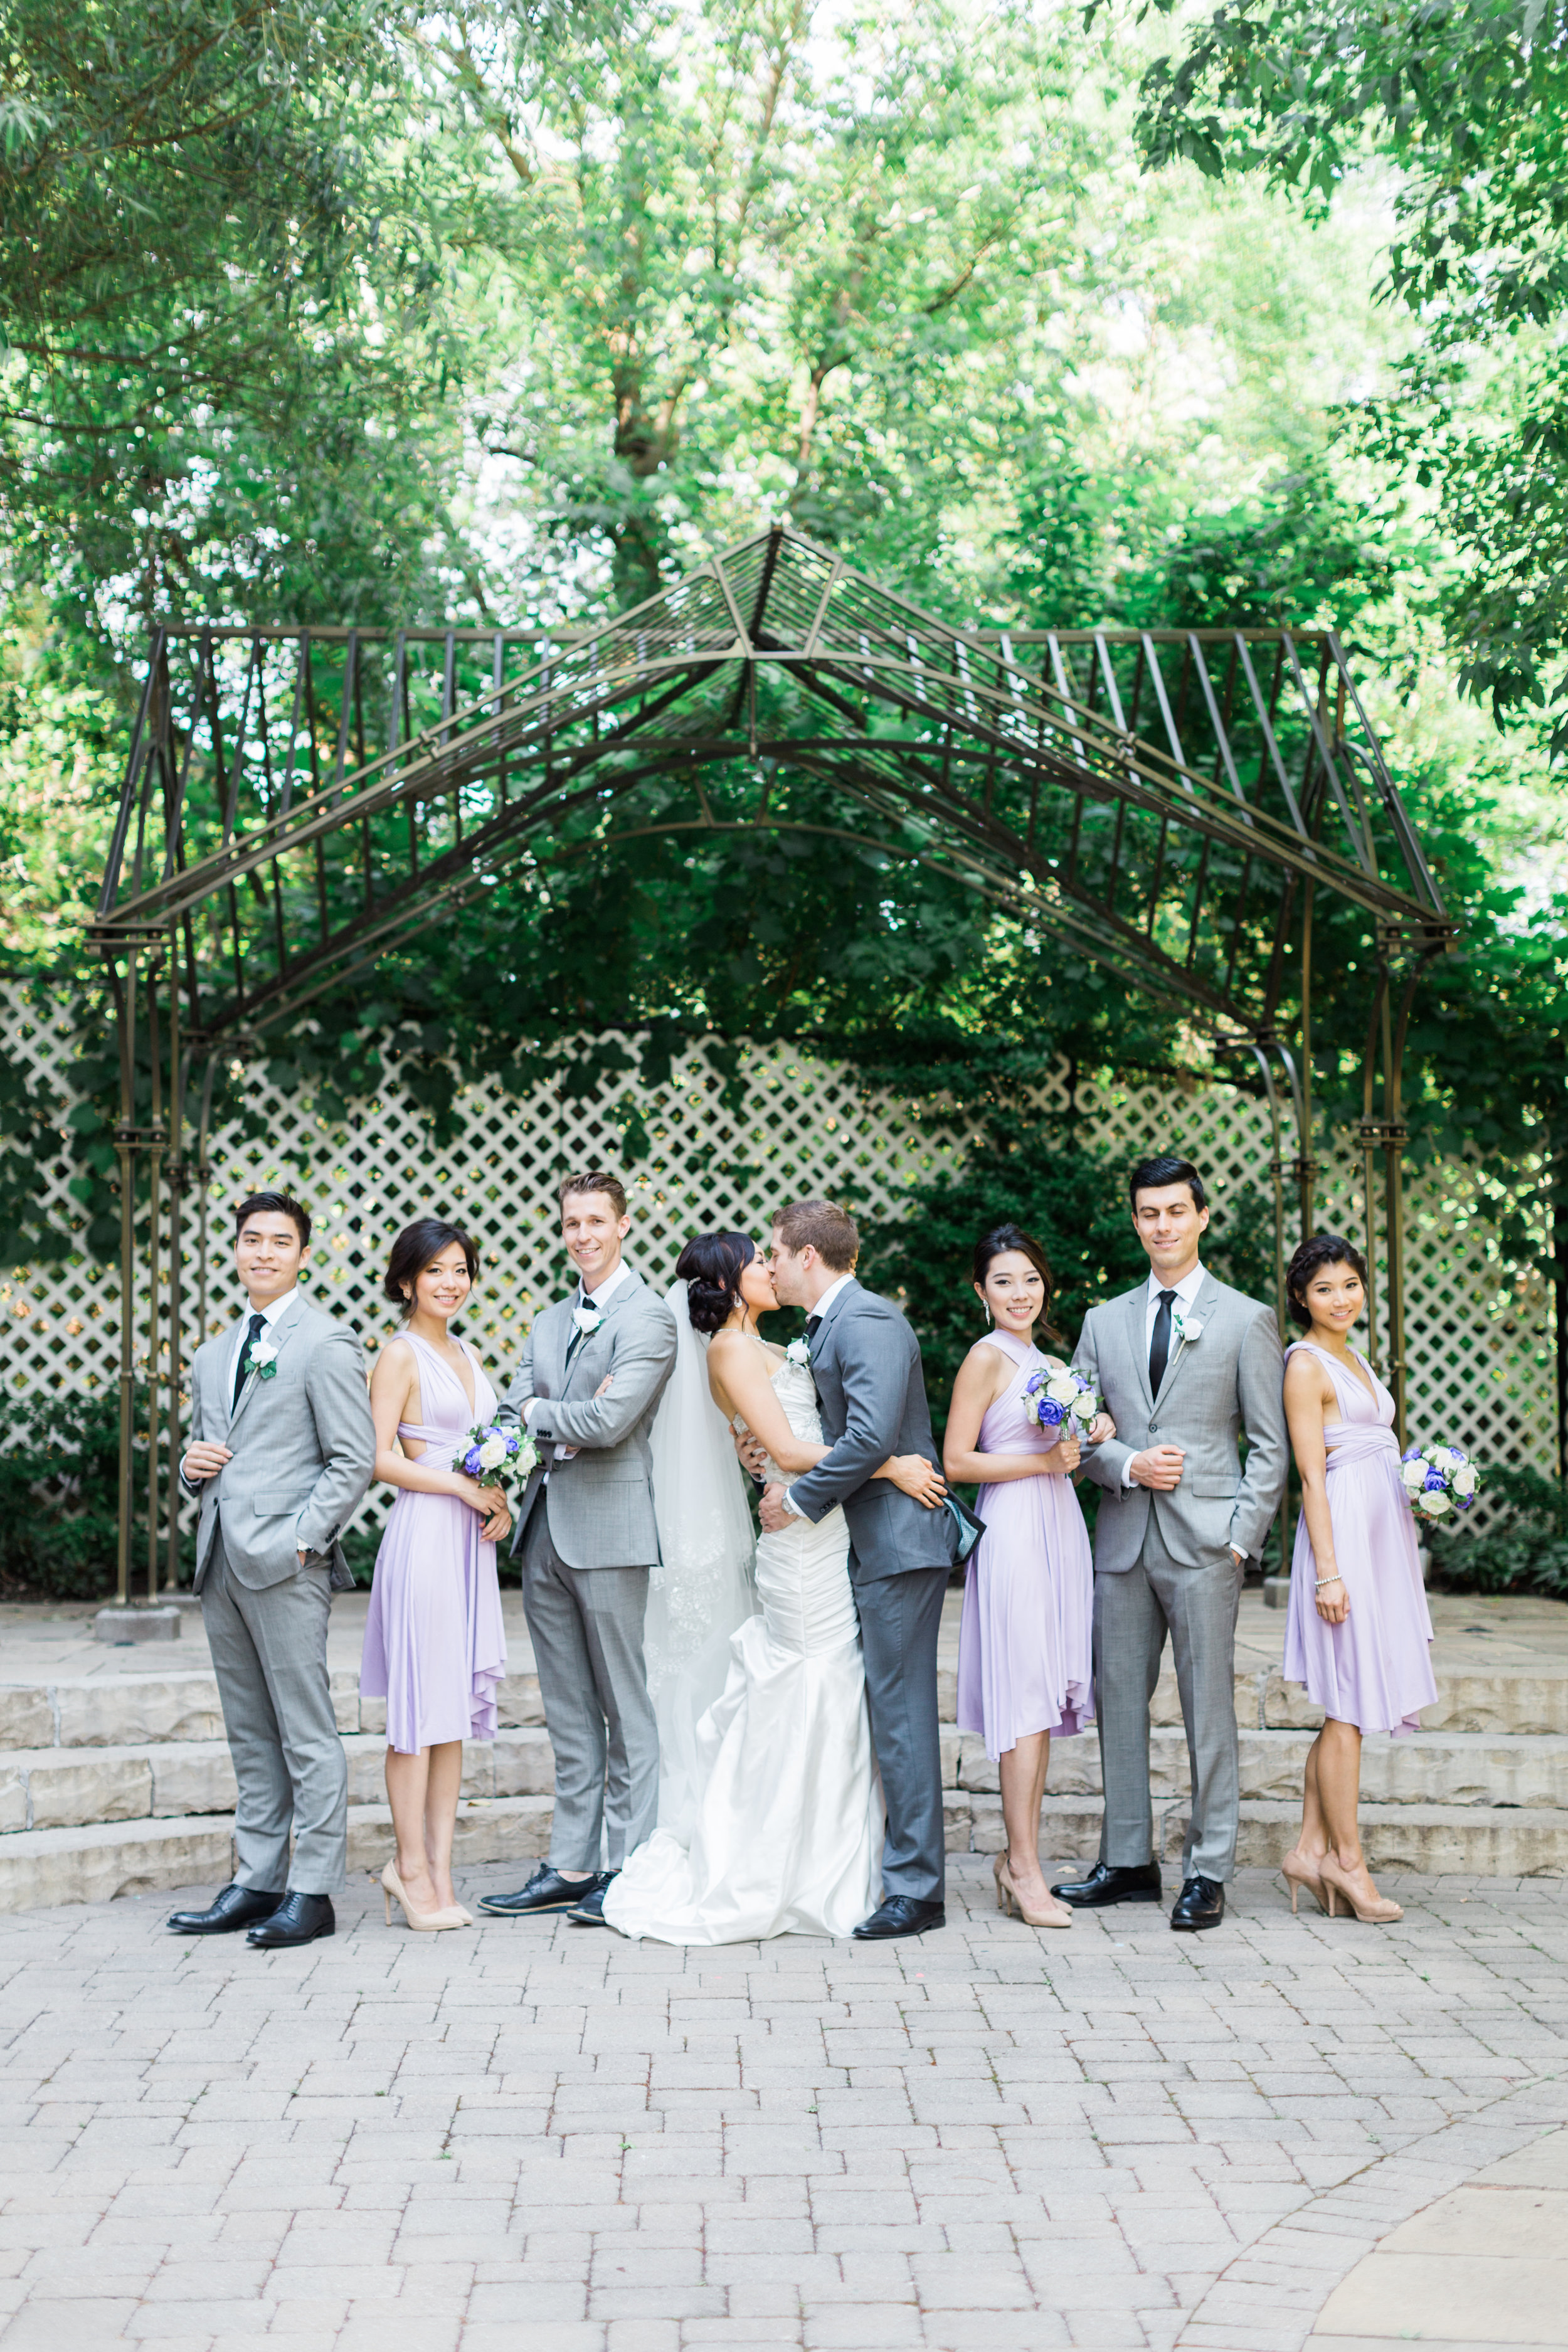 Toronto Fine Art Photographer - Old Mill Wedding - Bridal Party Photos-7.jpg